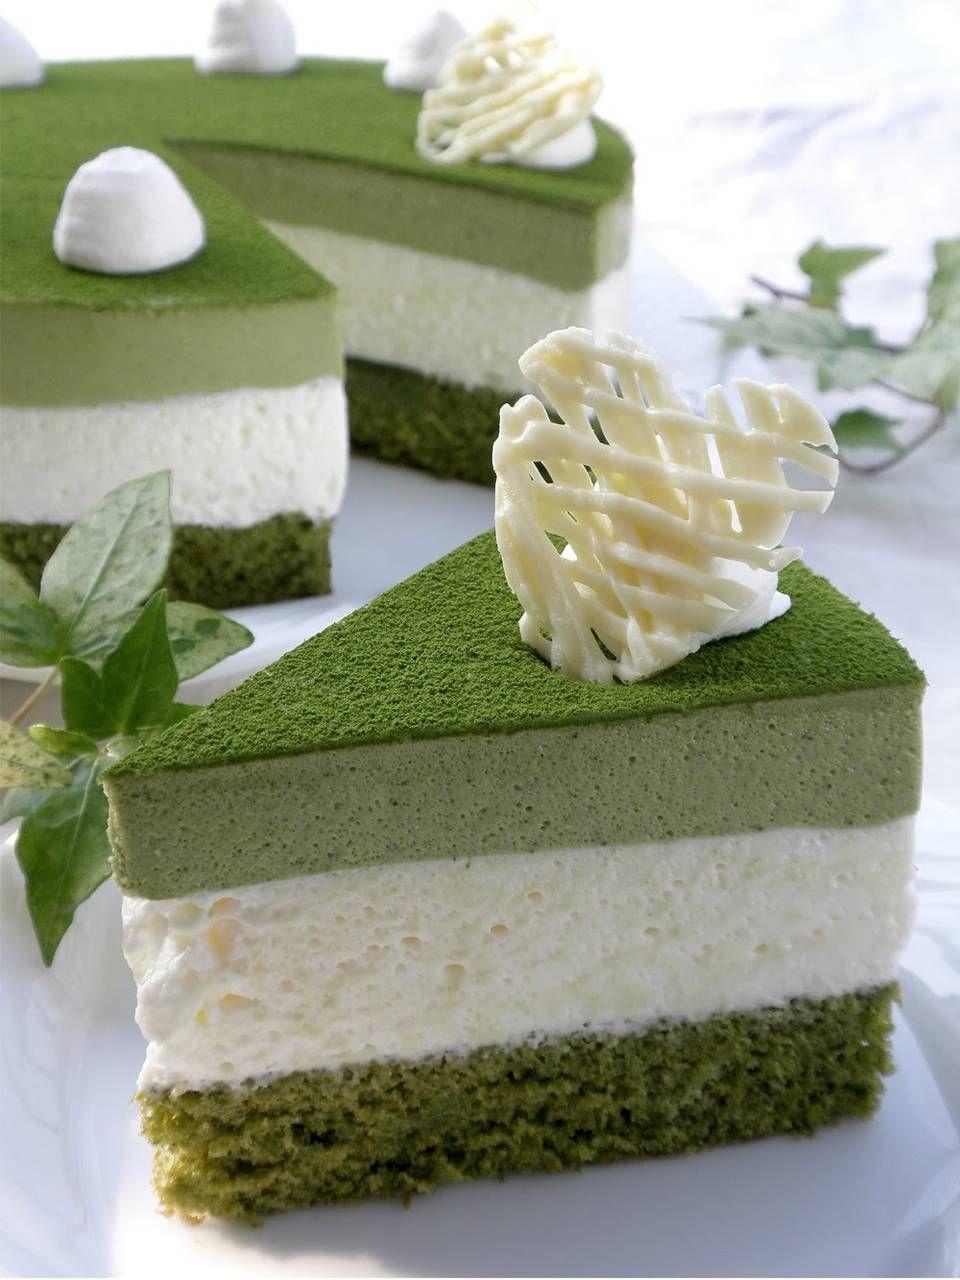 Green tea and white chocolate mousse cake recipe